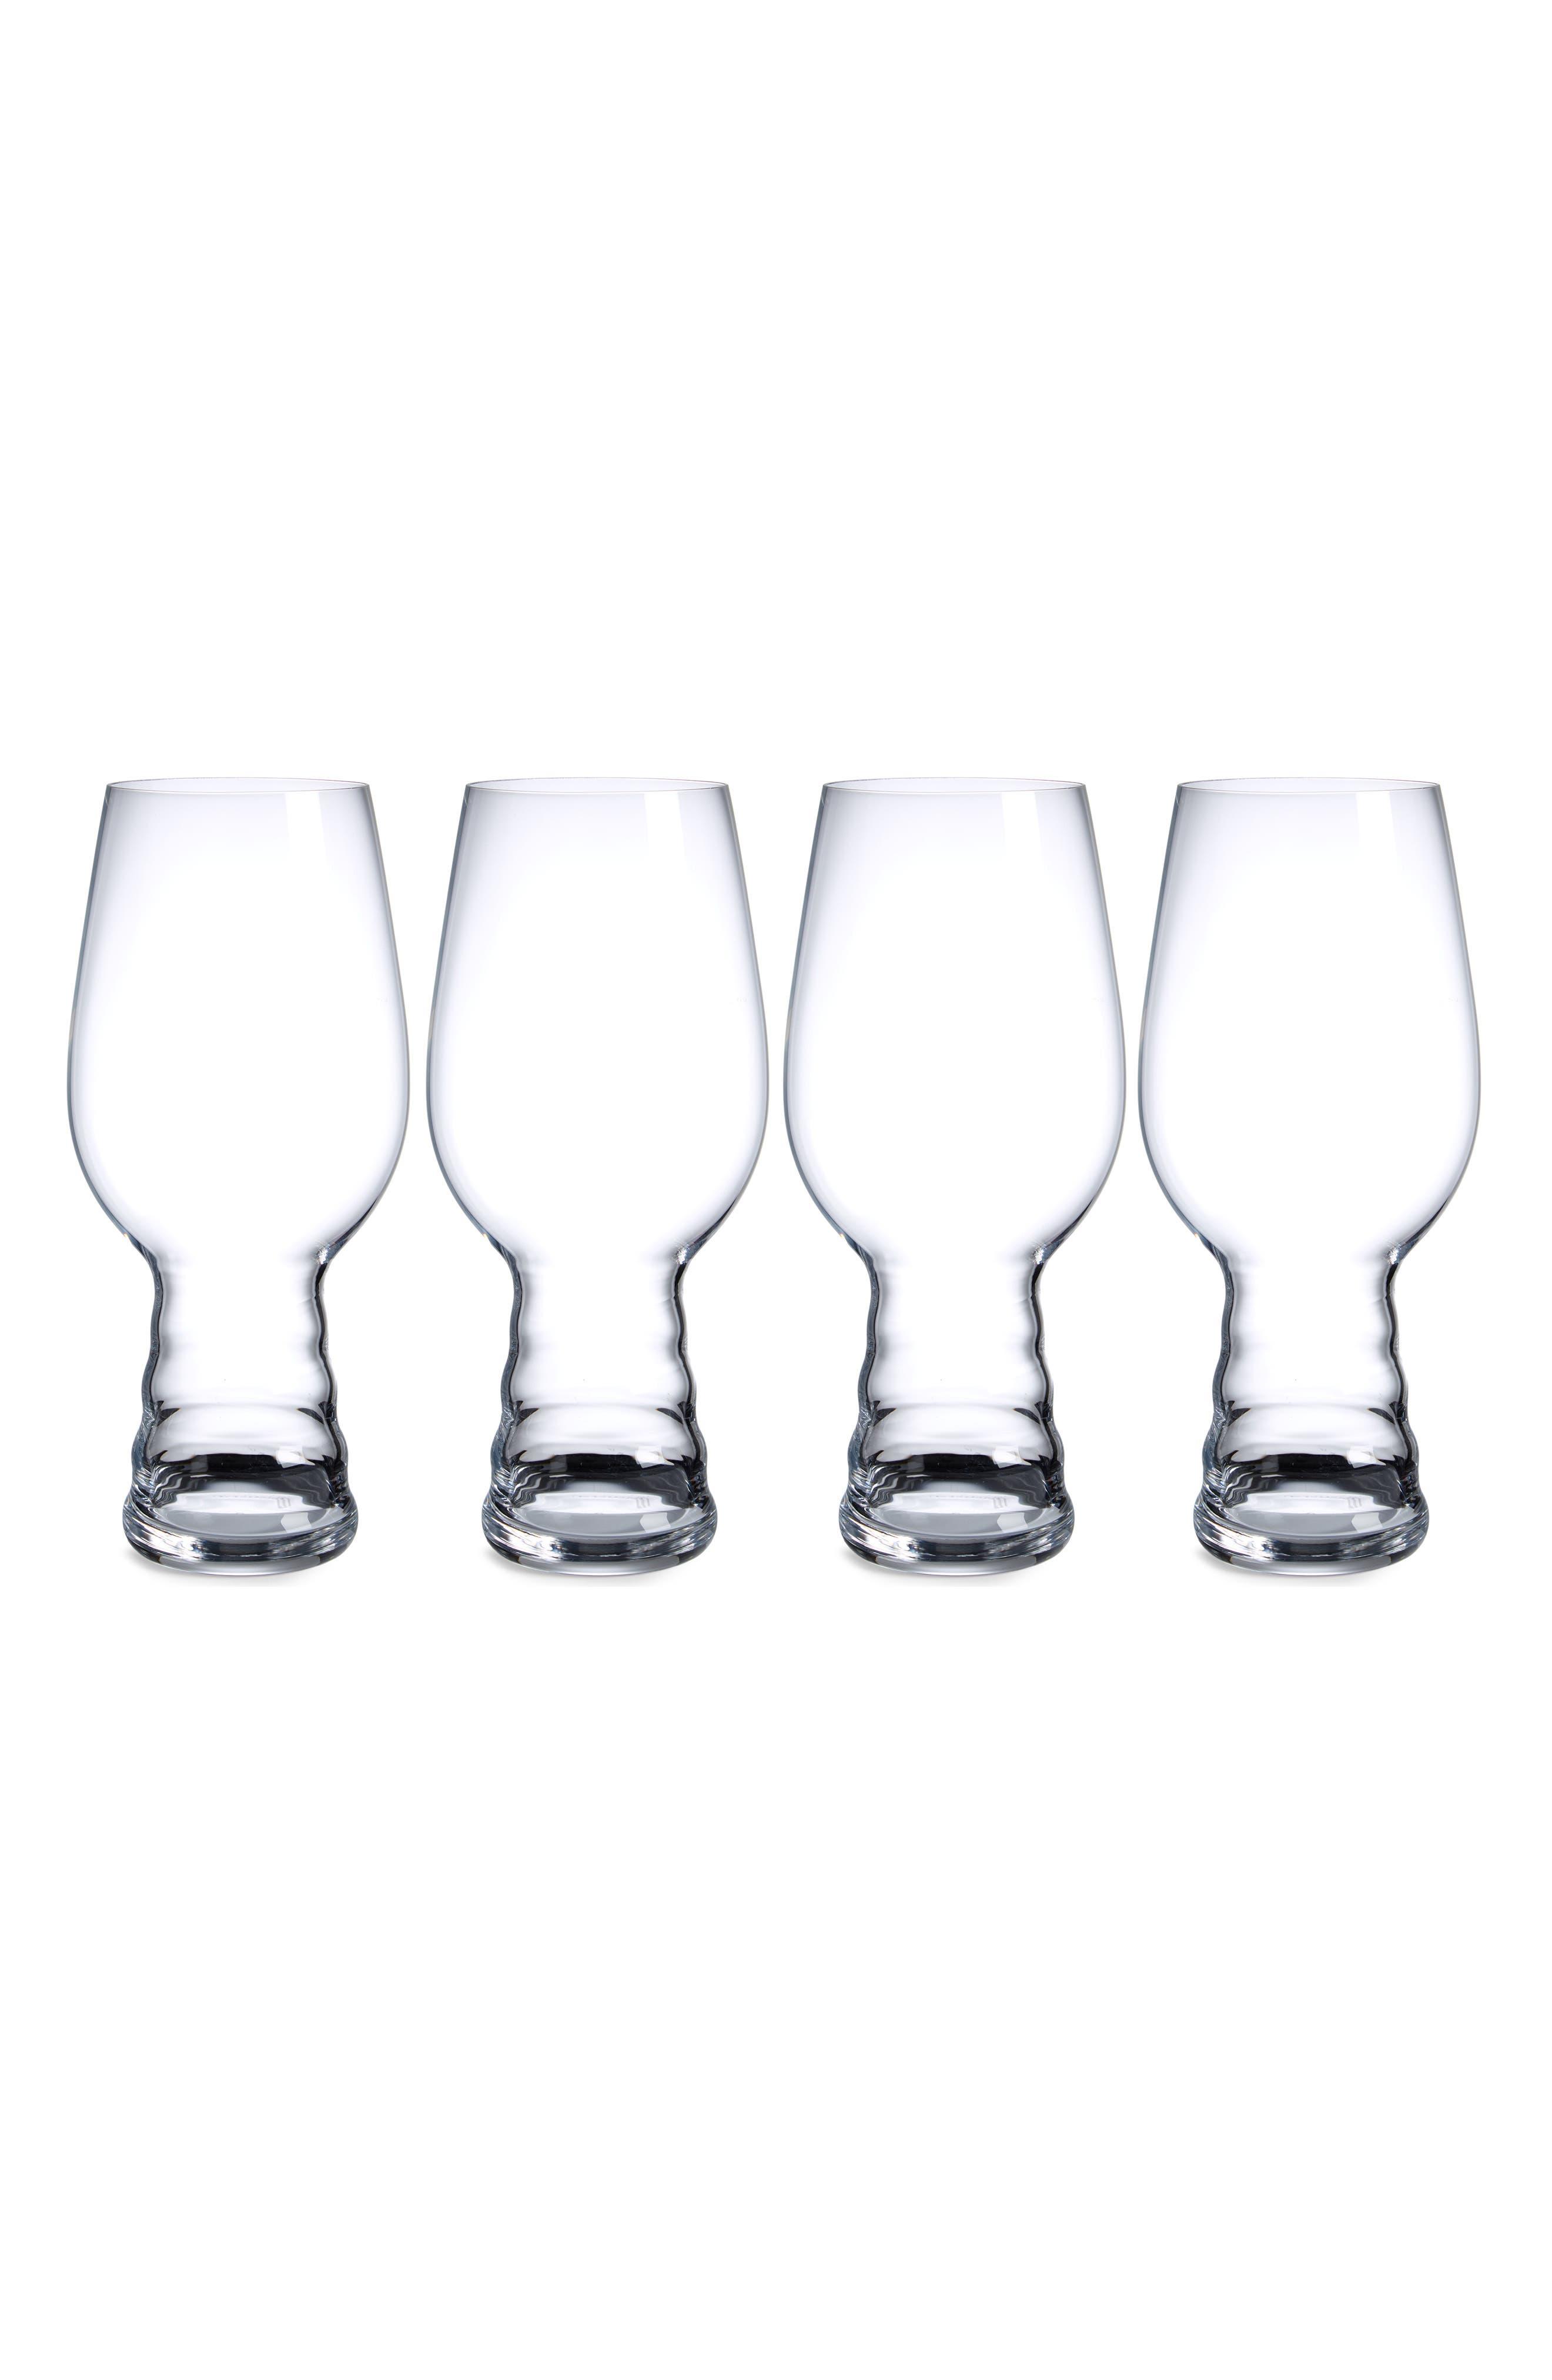 Set of 4 IPA Glasses,                             Main thumbnail 1, color,                             100